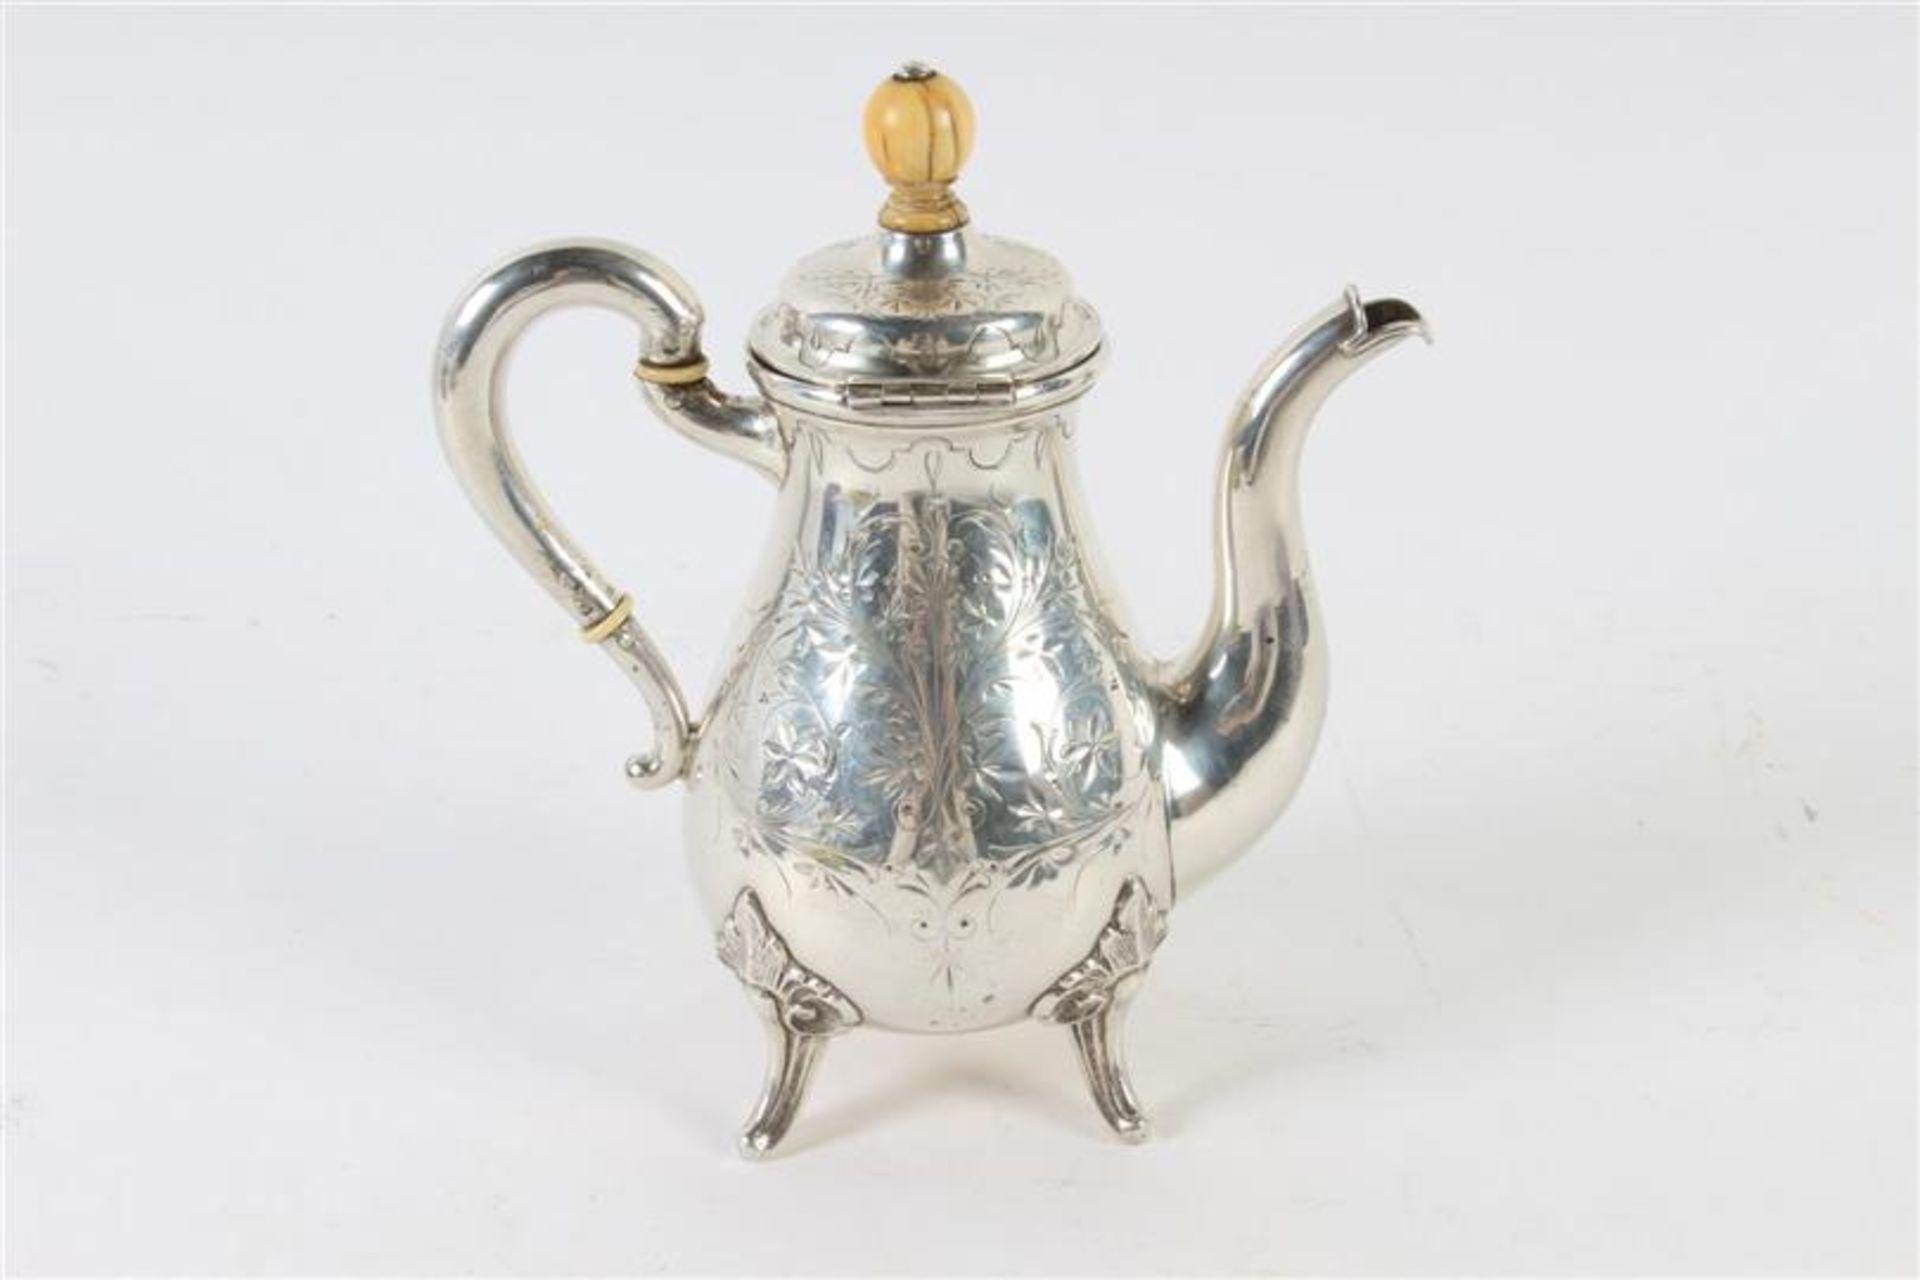 Los 21 - Zilveren mocca schenkkannetje, Biedermeier, 19e eeuw. H: 18 cm.